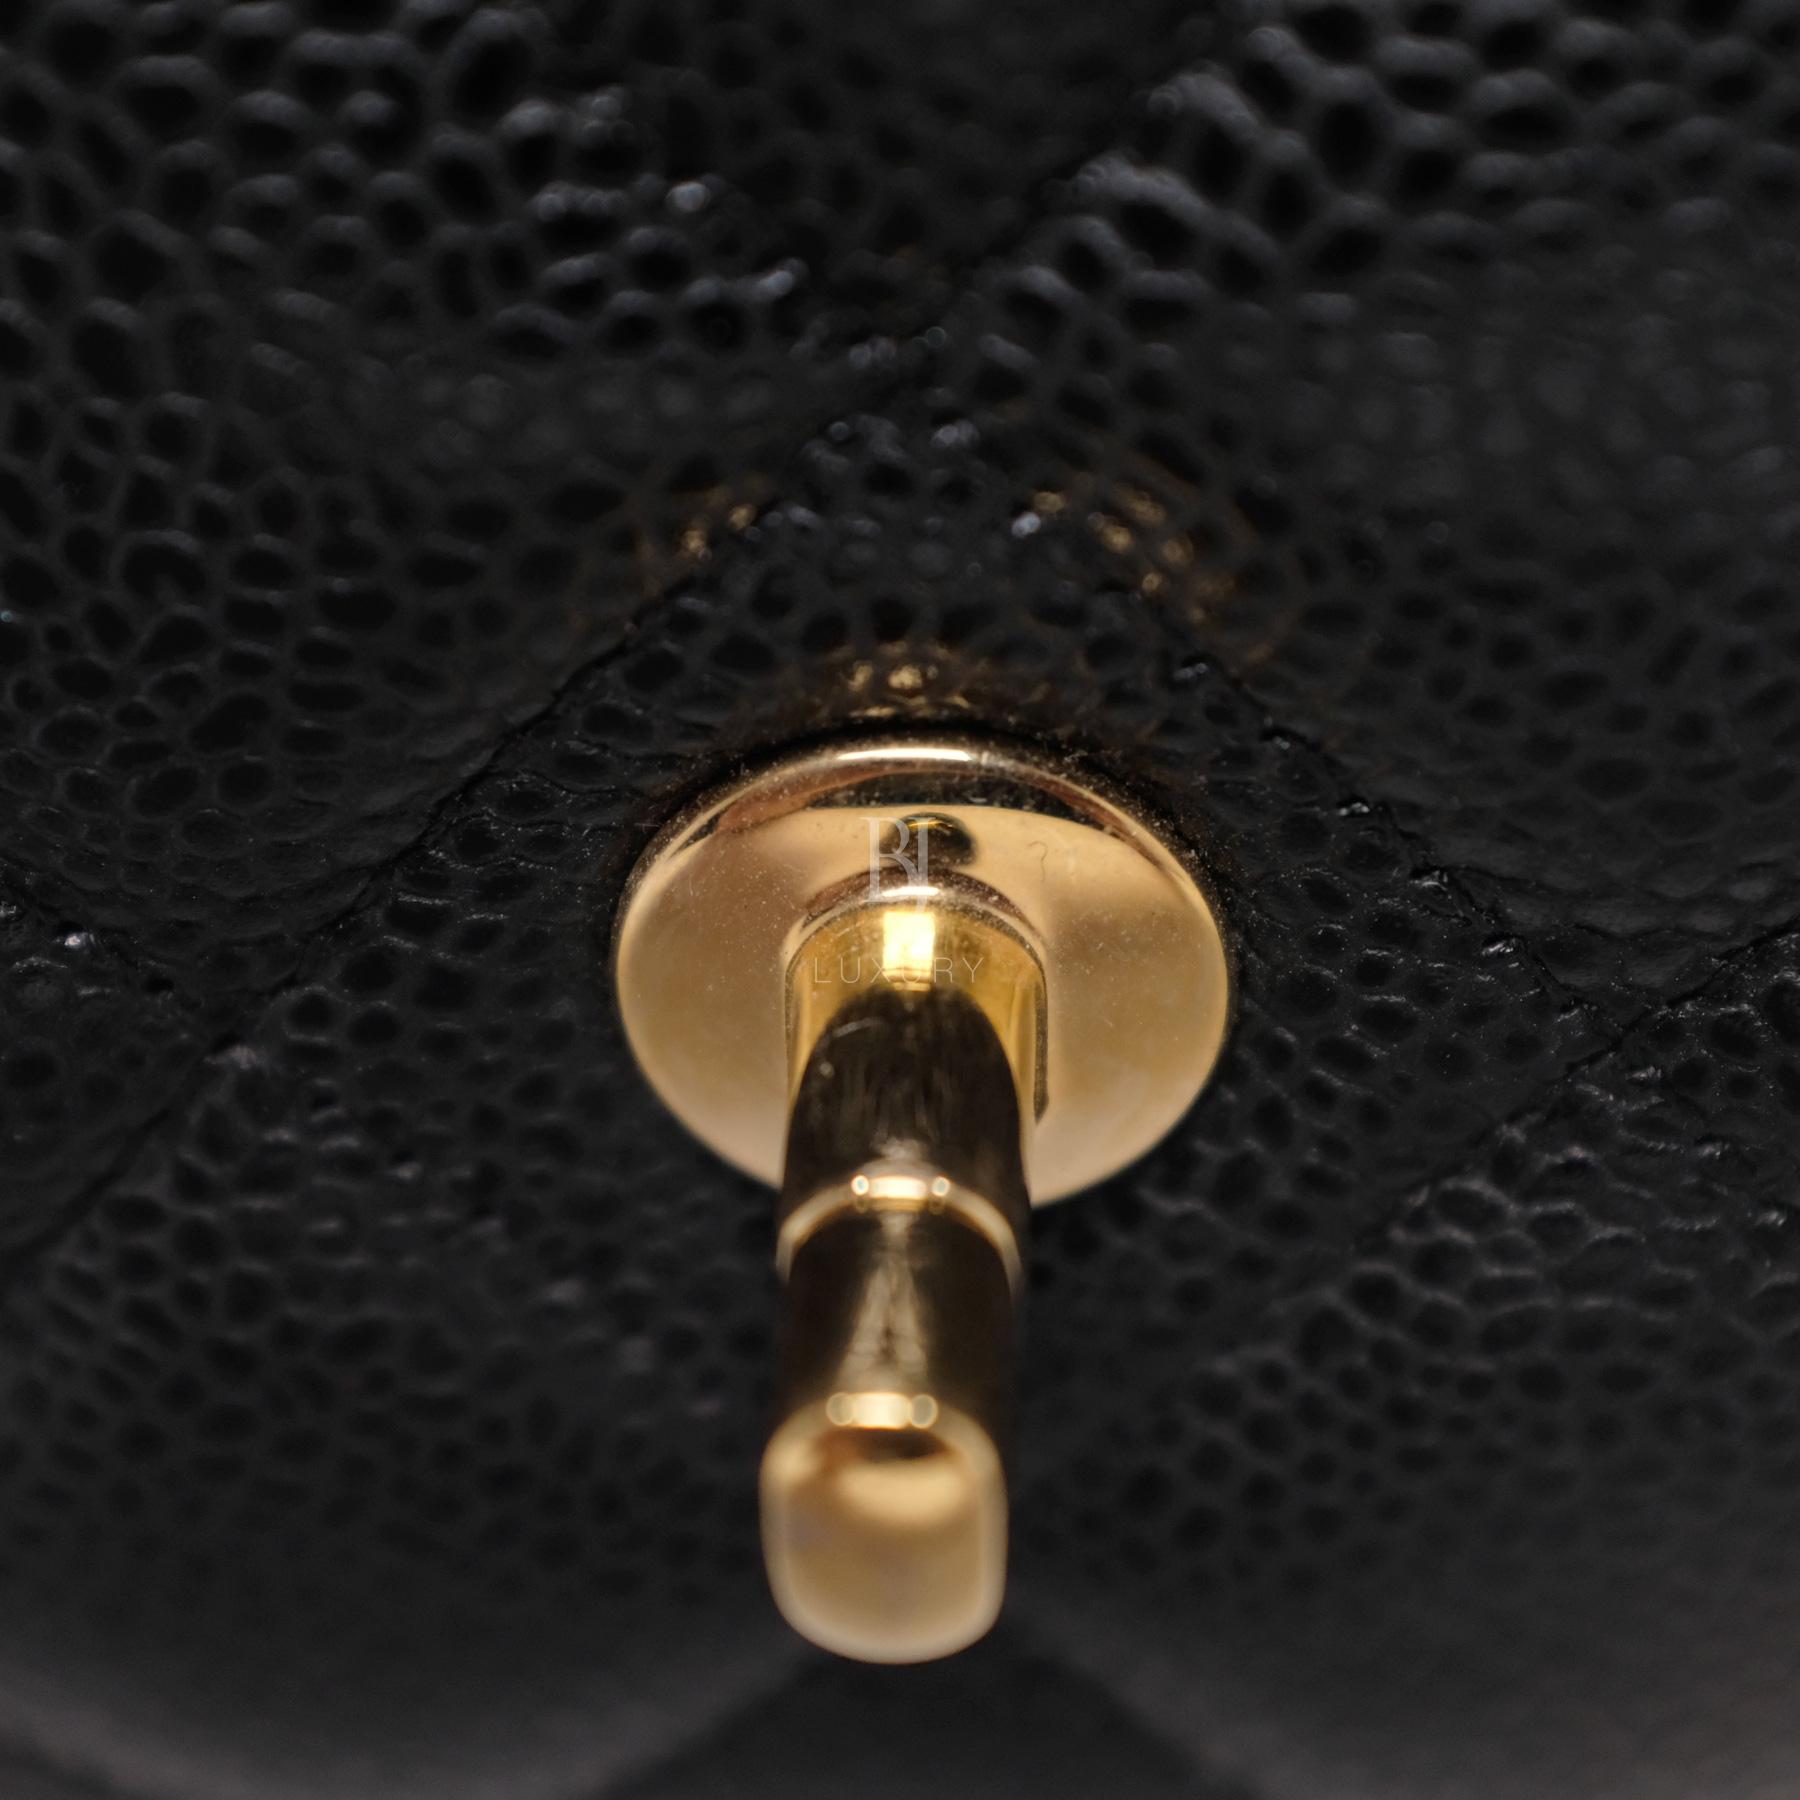 Chanel Classic Handbag Caviar Maxi Black BJ Luxury 17.jpg